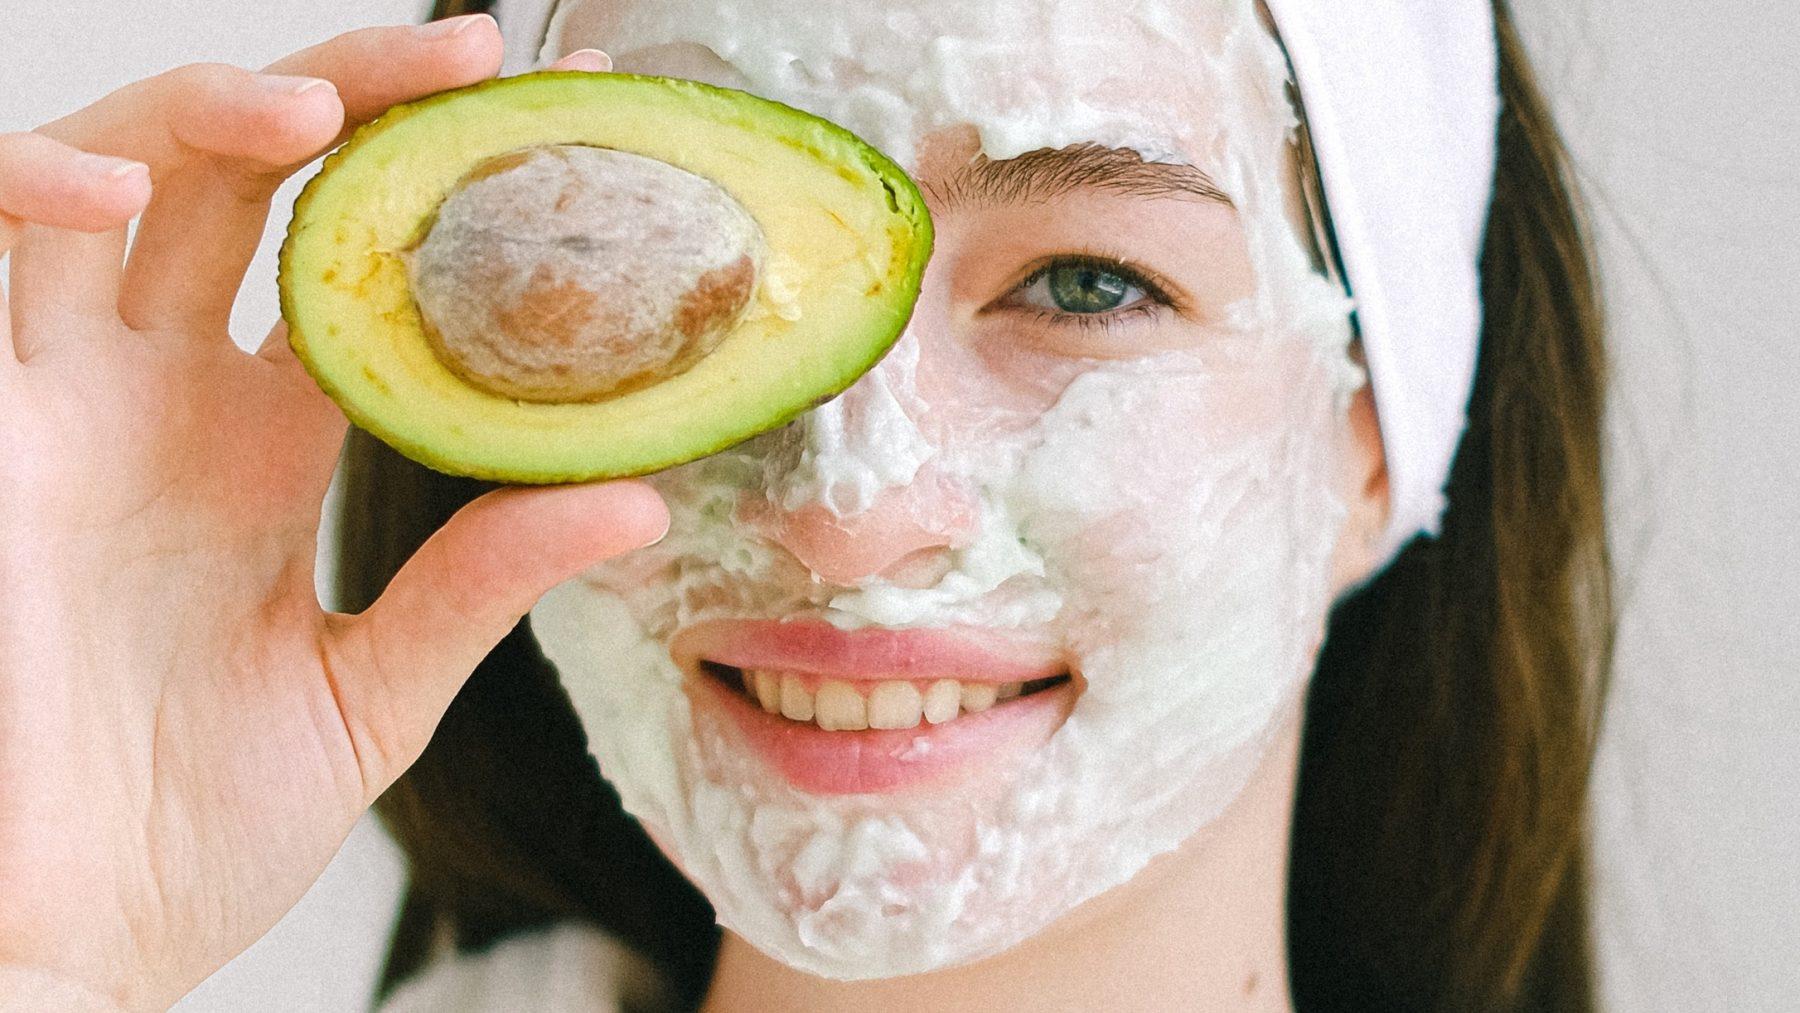 Van Rummikub toernooi tot avocadomasker: 5 x wat nog wél kan met de avondklok